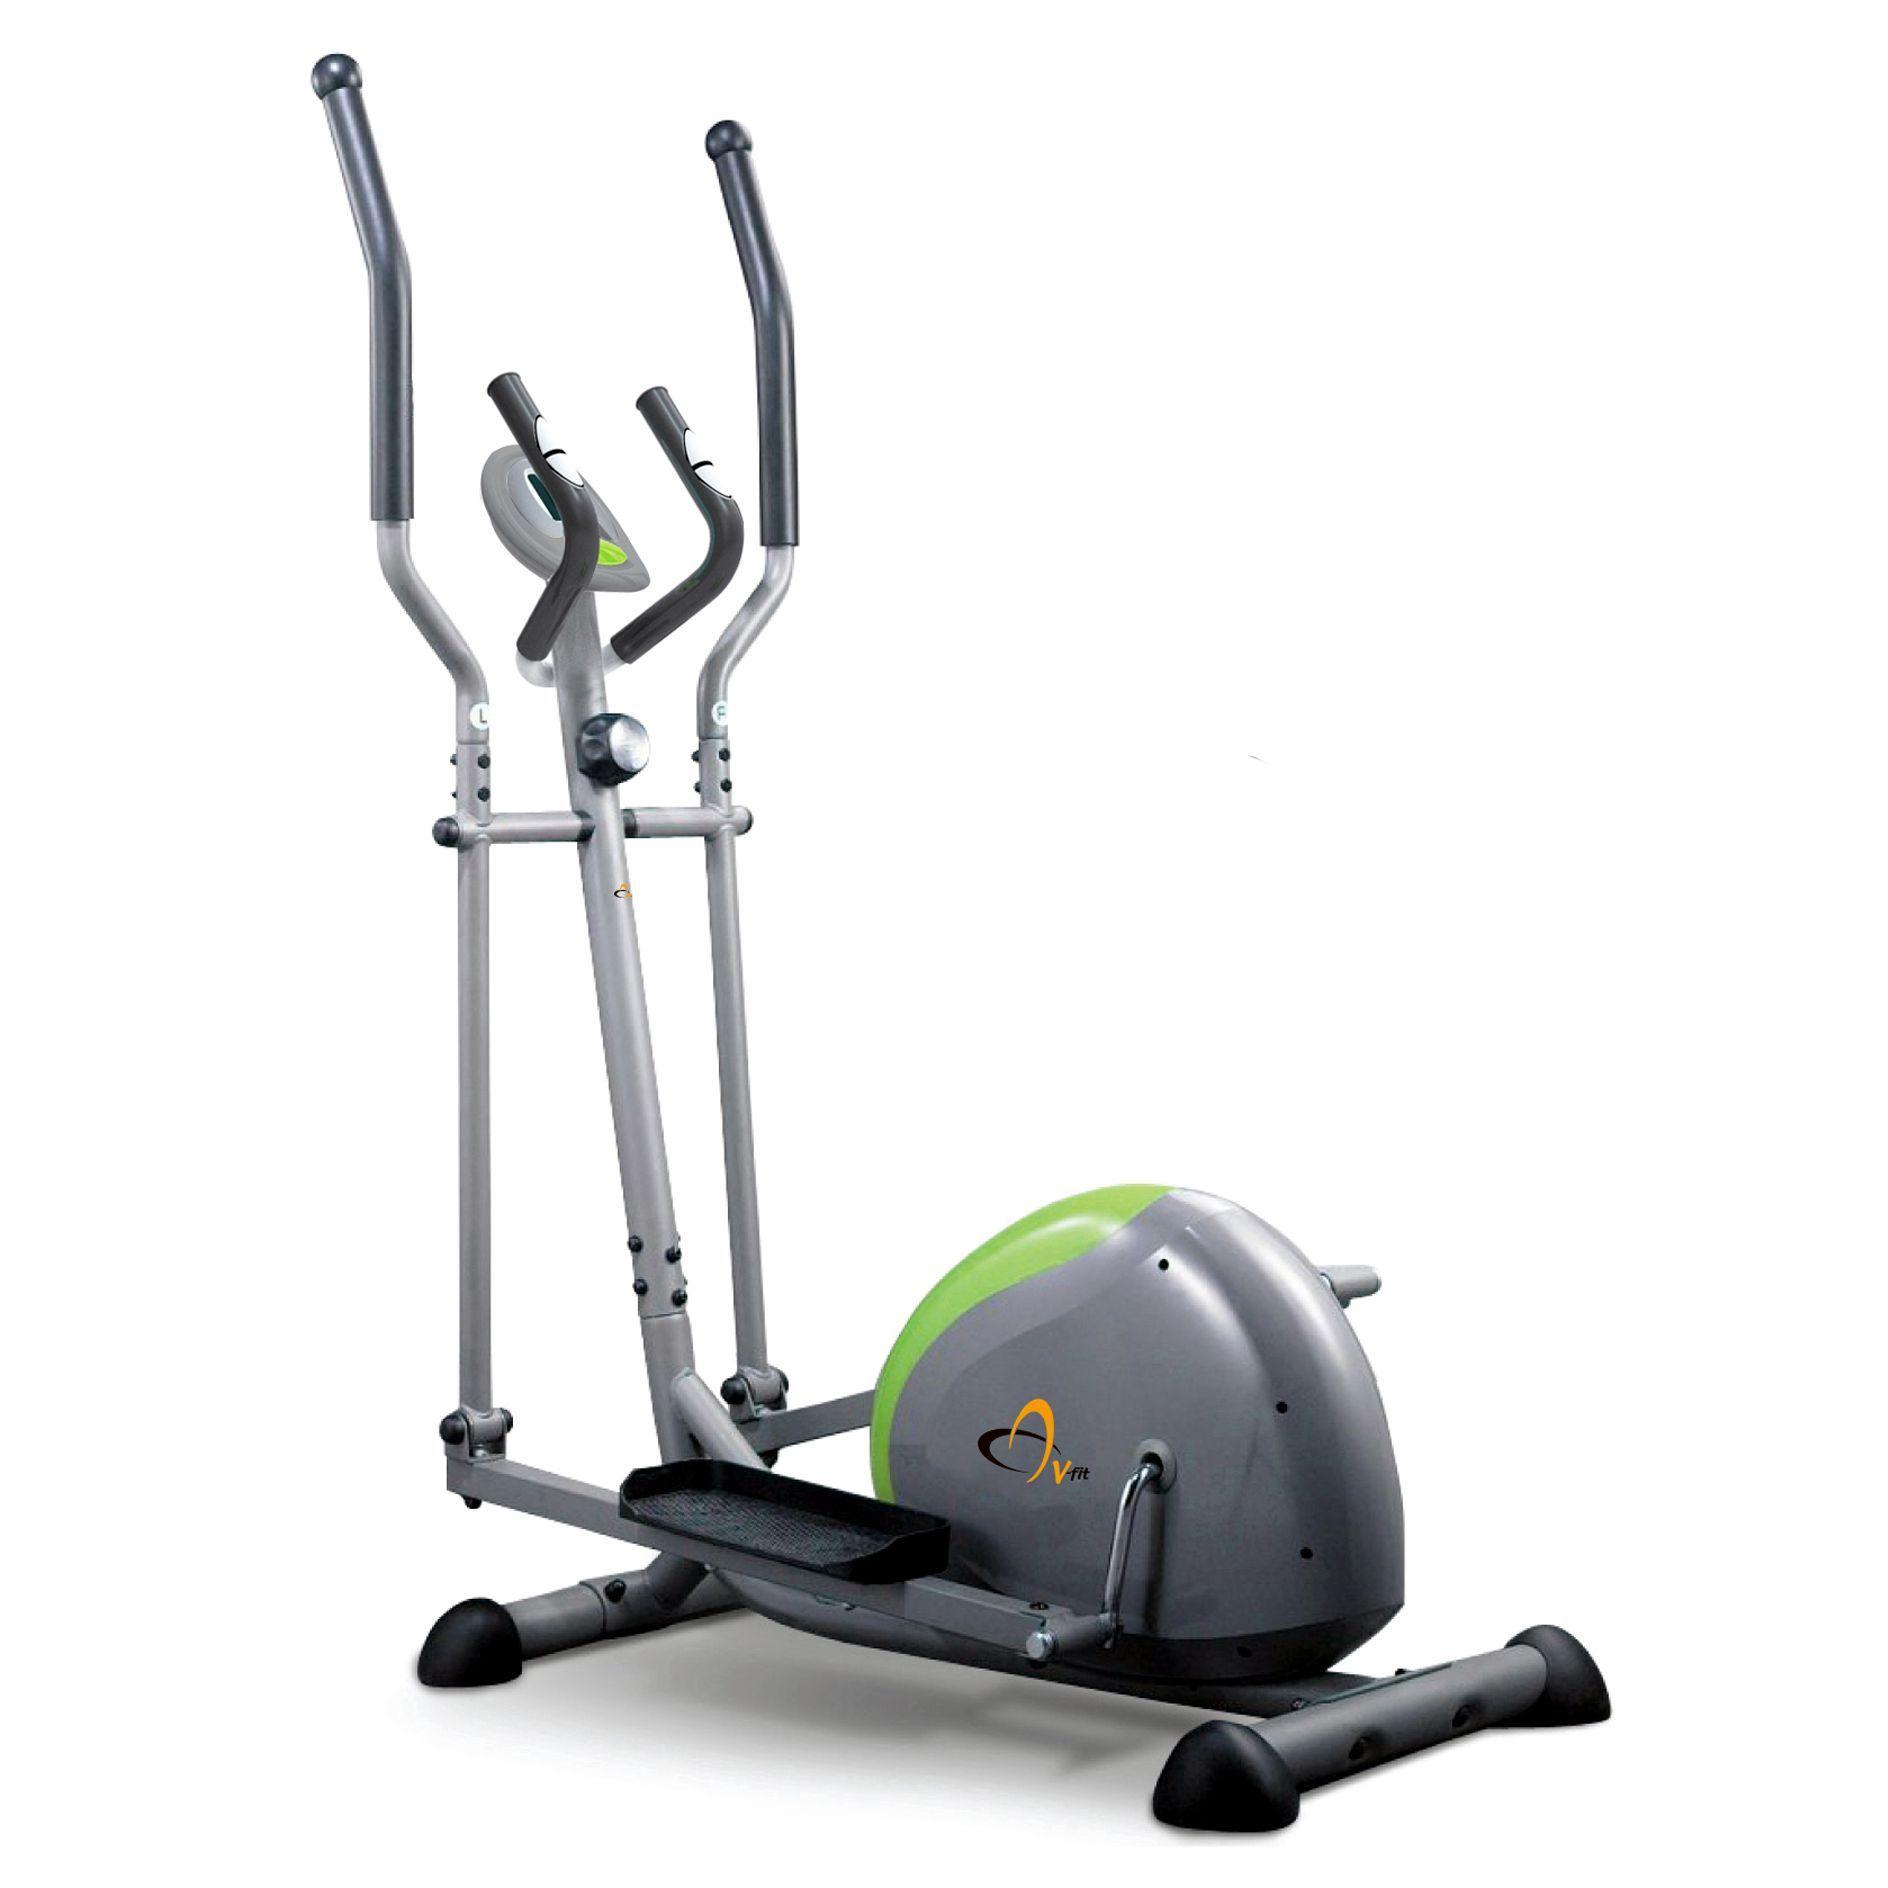 Lifemax Elliptical Bike: V-fit G Series ET Magnetic Elliptical Cross Trainer